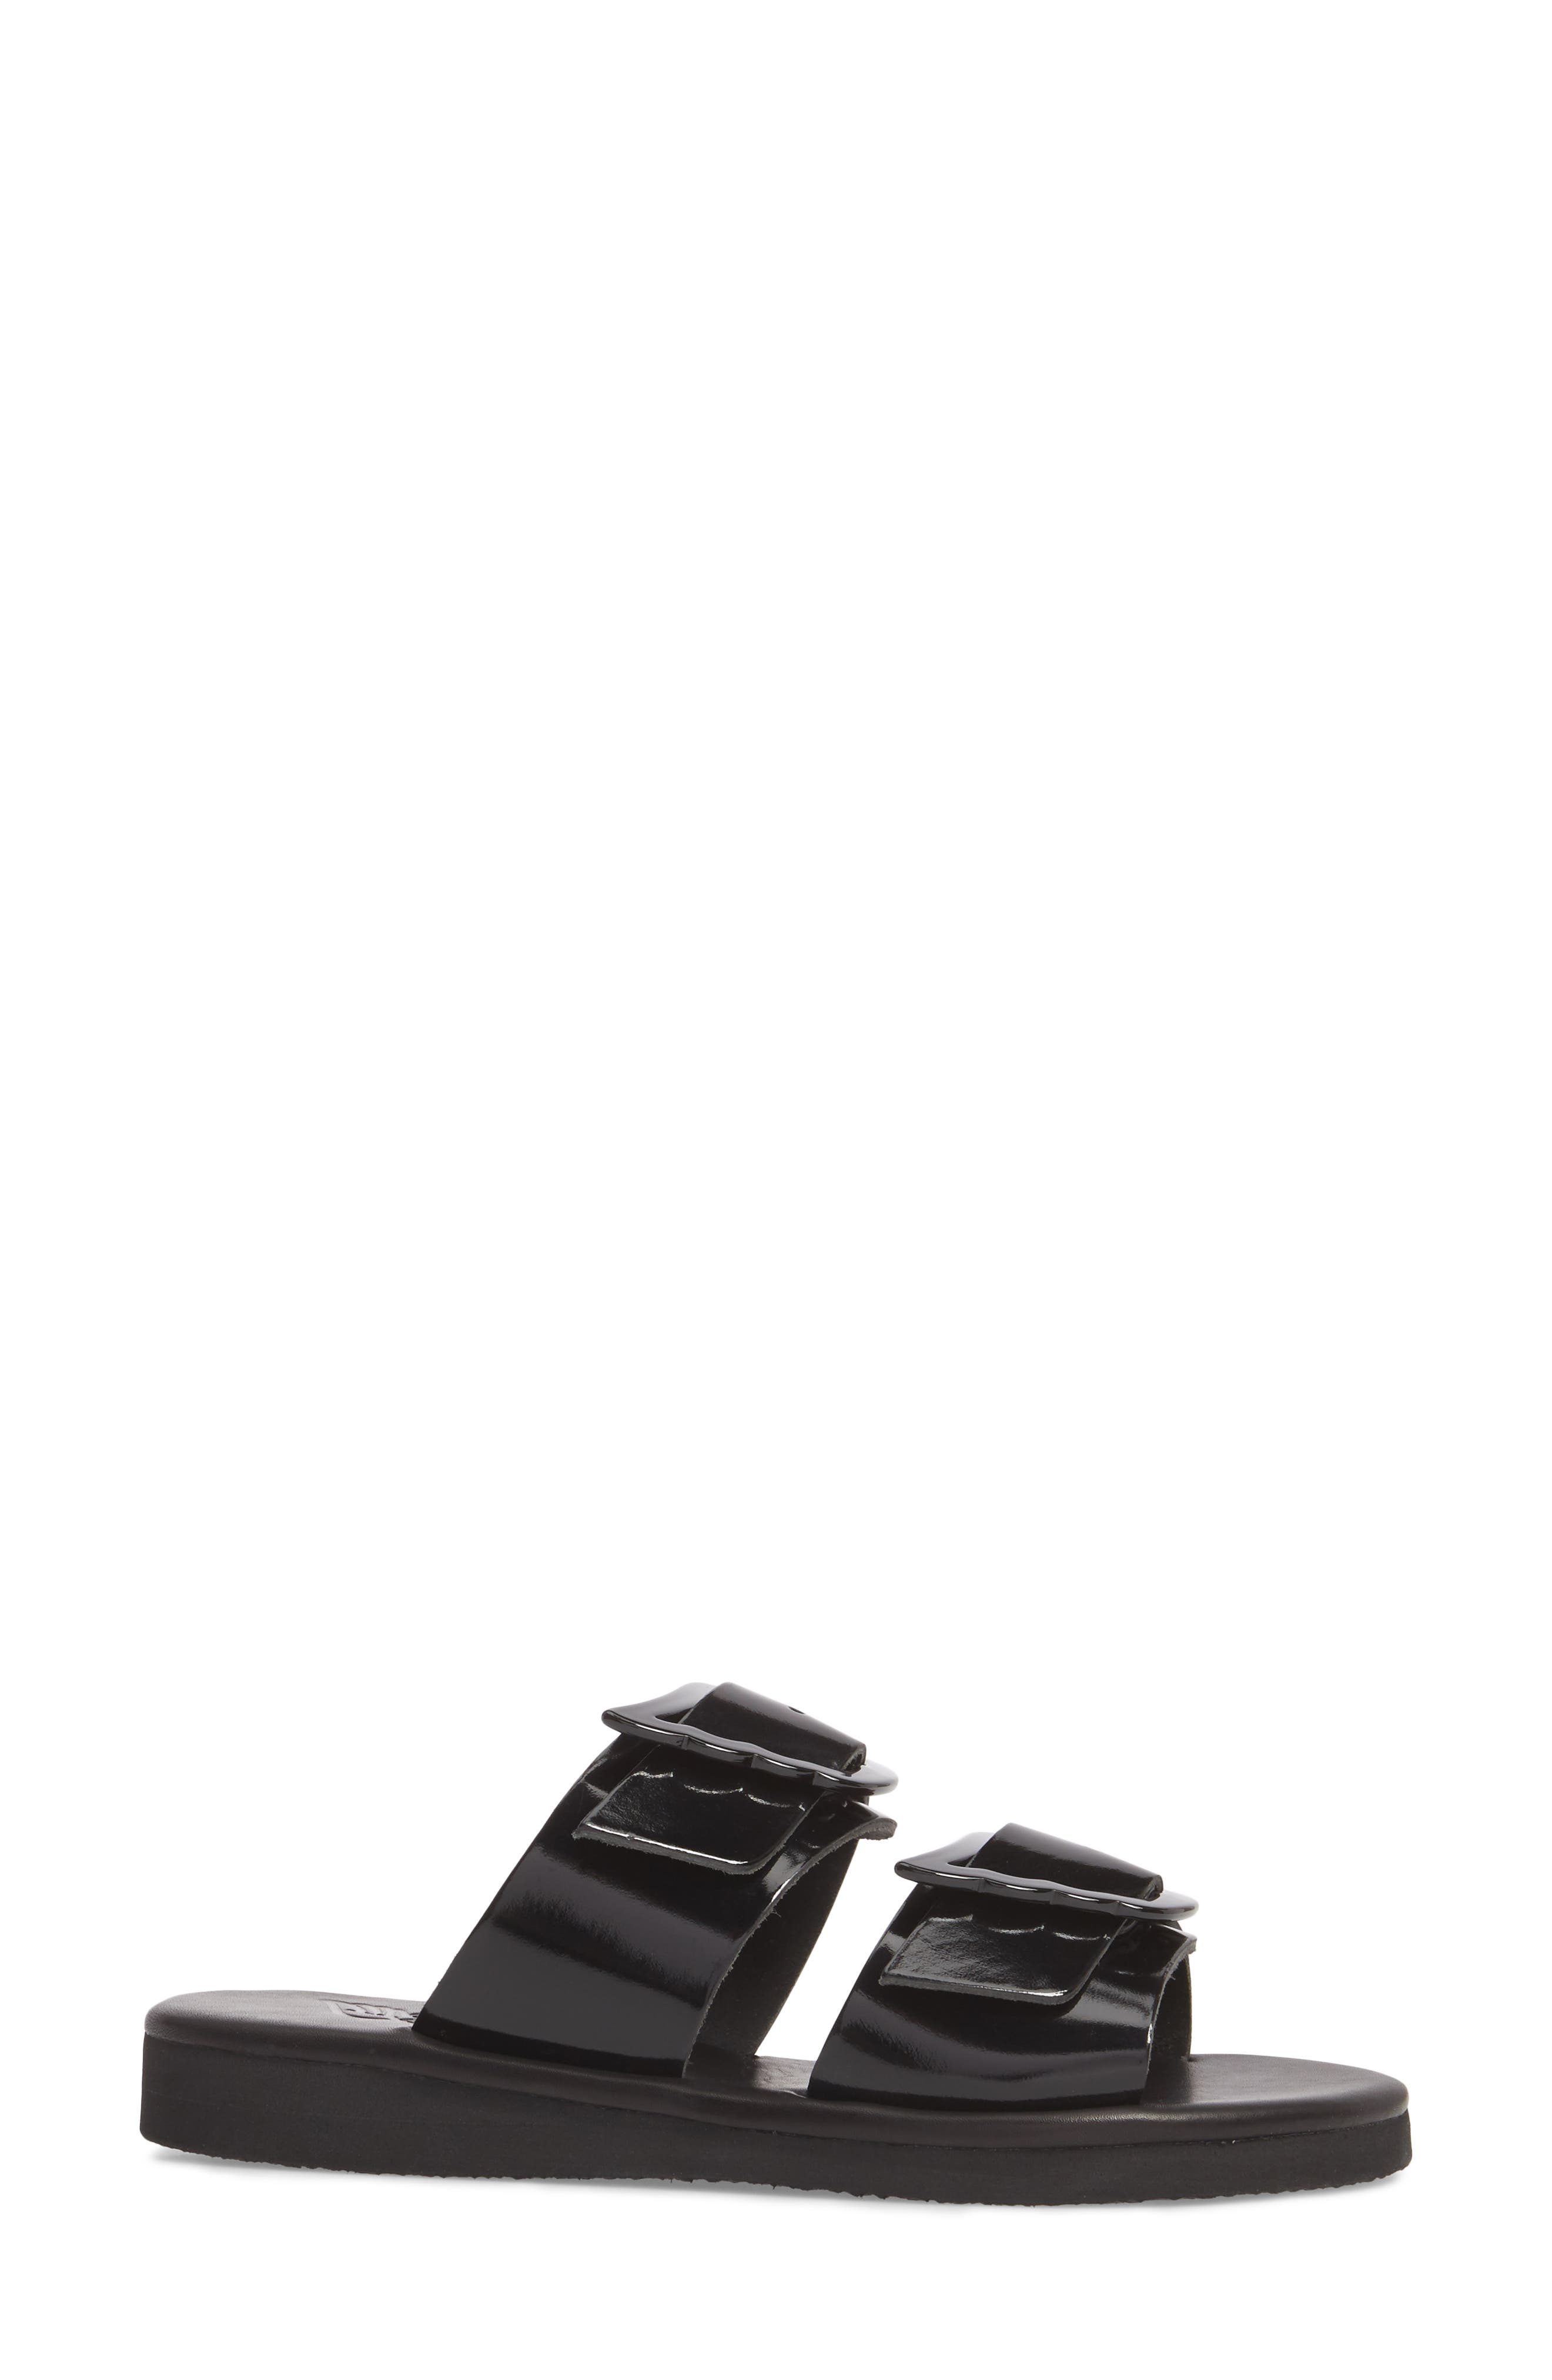 Iaso Slide Sandal,                             Alternate thumbnail 3, color,                             Black